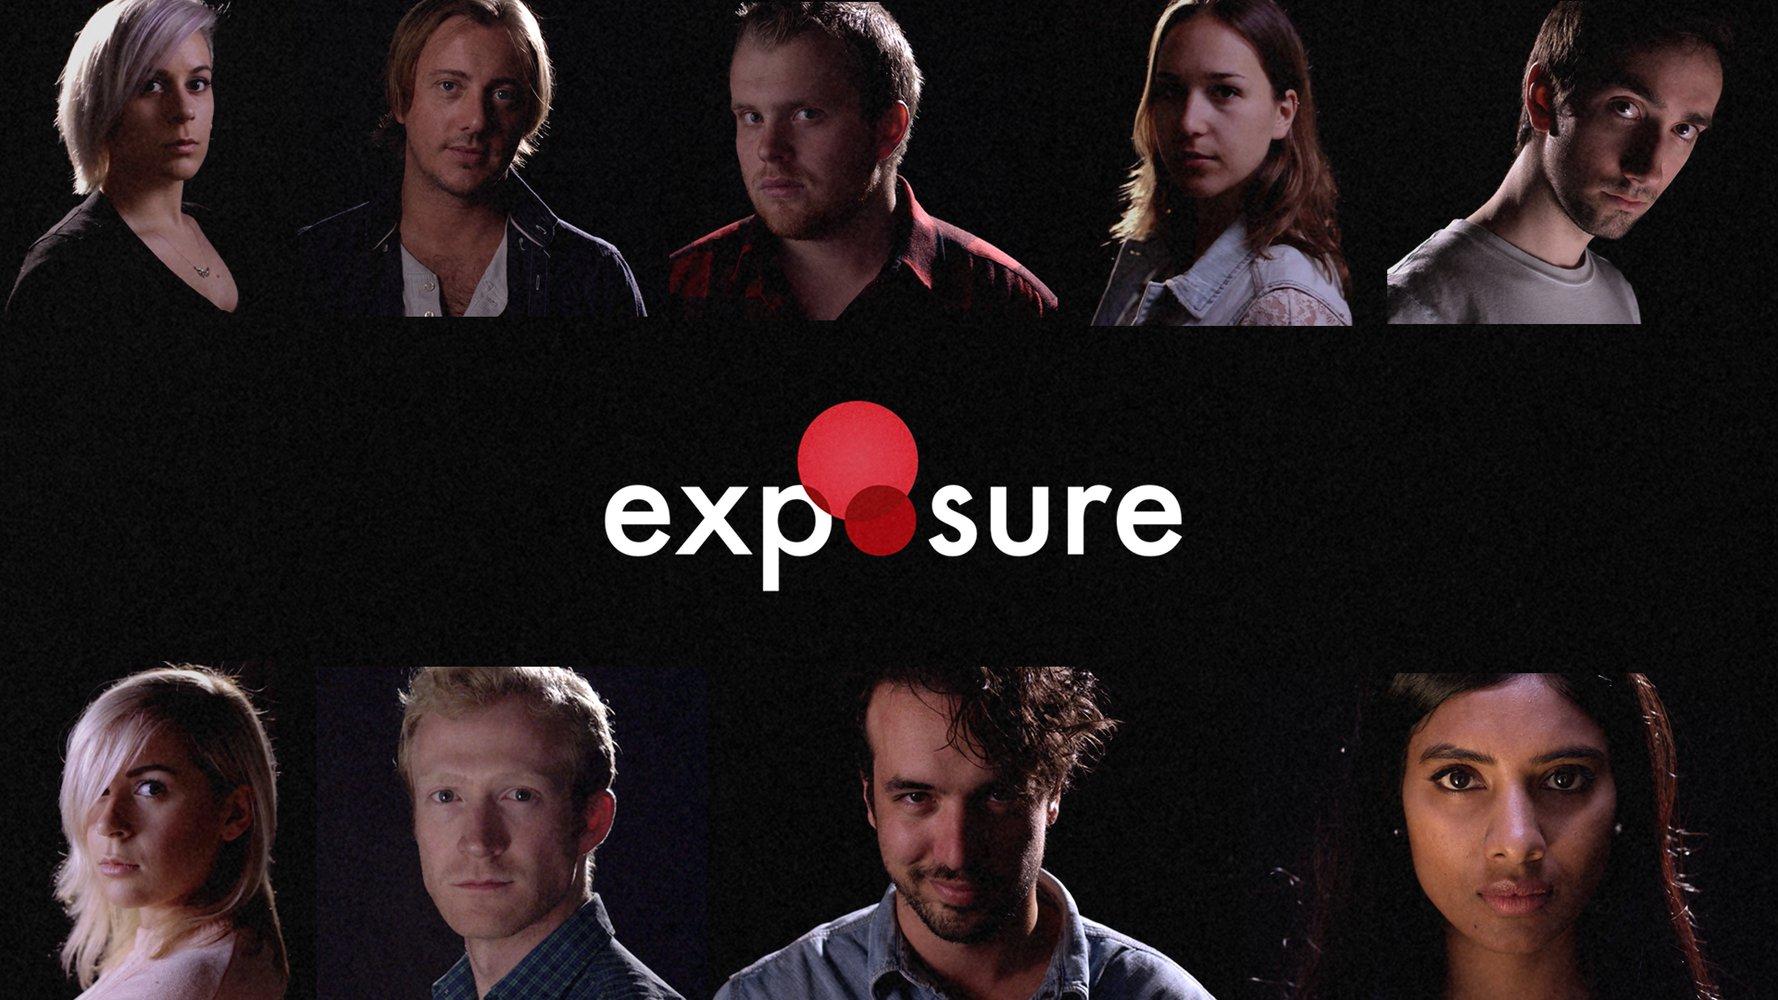 Exposure Team, May 2013